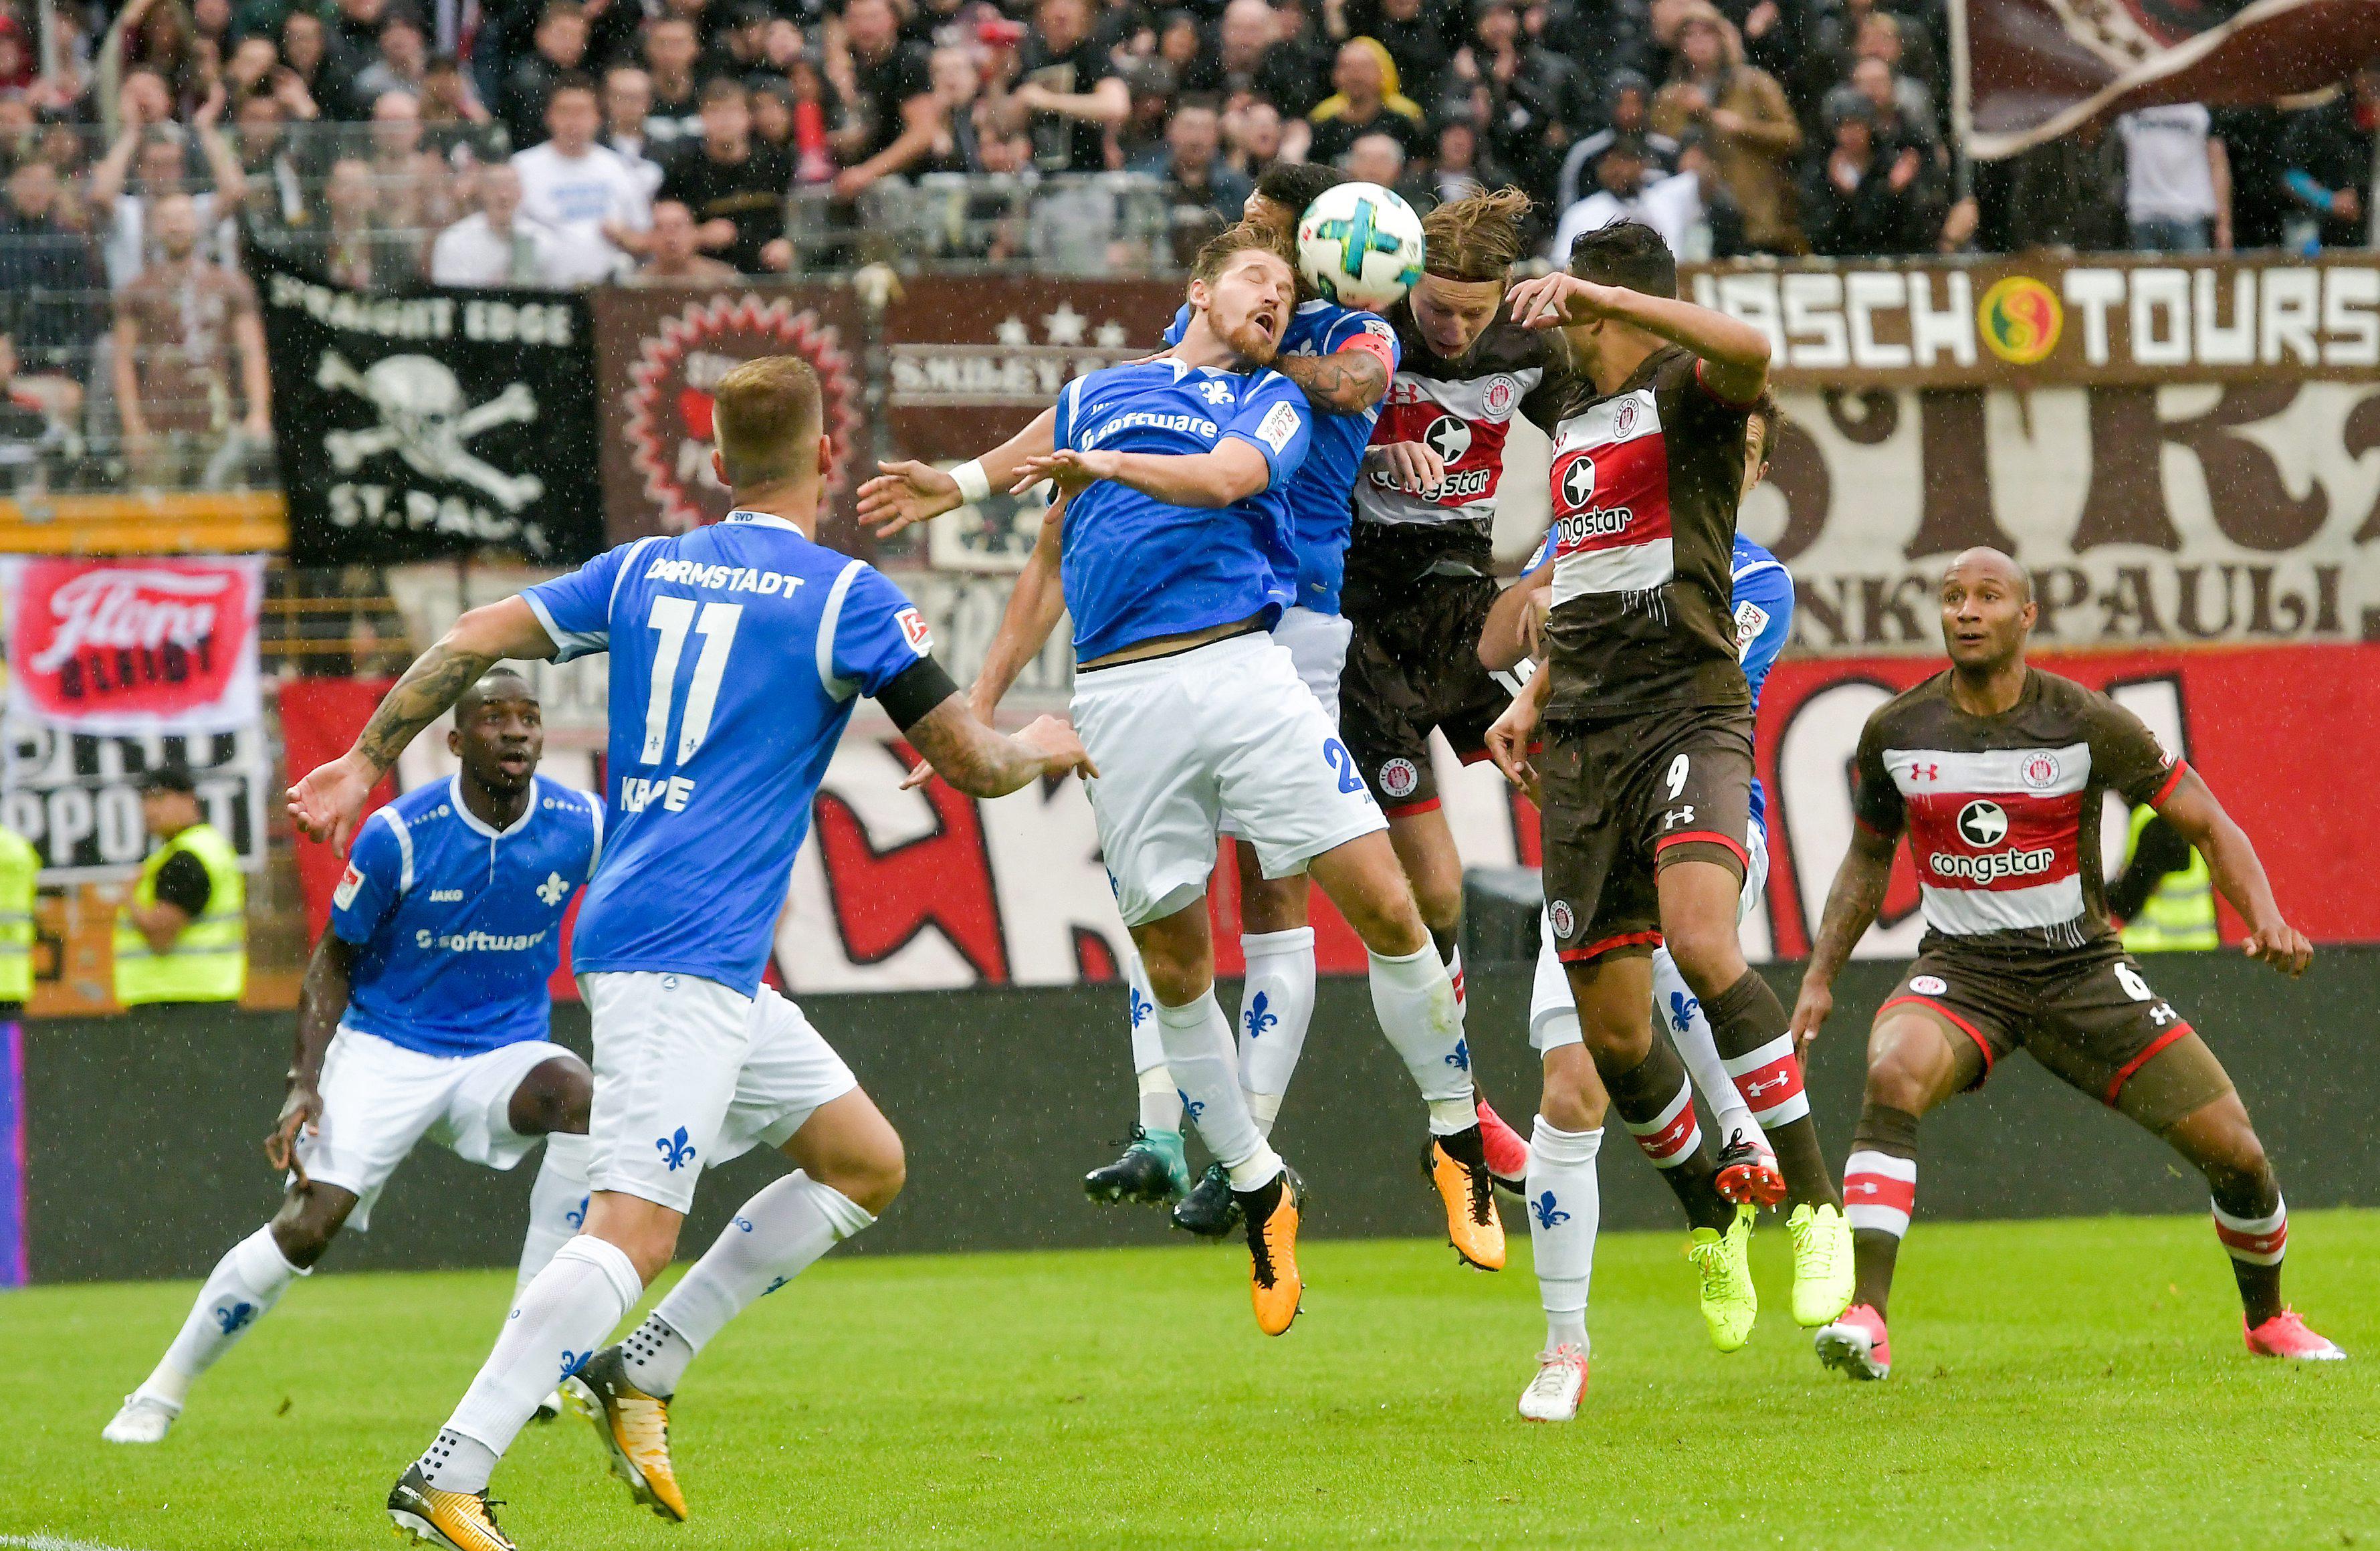 Heimspiele gegen Duisburg, Bochum, Darmstadt & Nürnberg – Infos zum Kartenverkauf